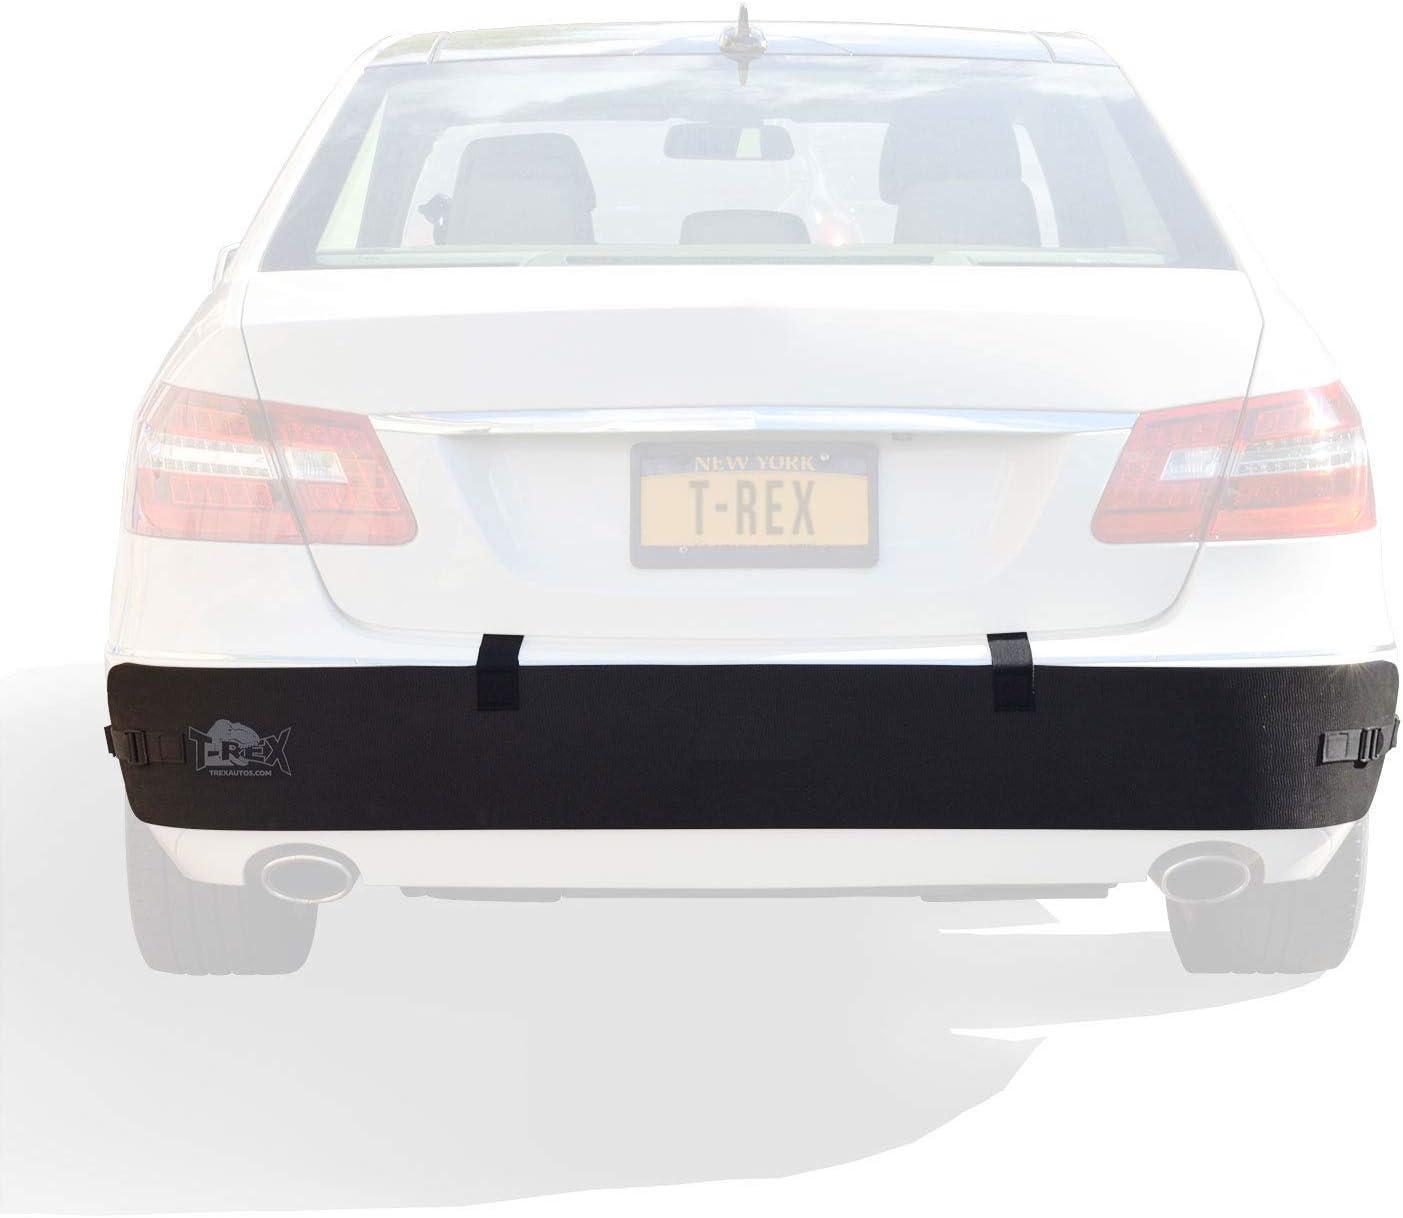 4 High Front or Rear Bumper Guard for Cars T-Rex Bumper Protector